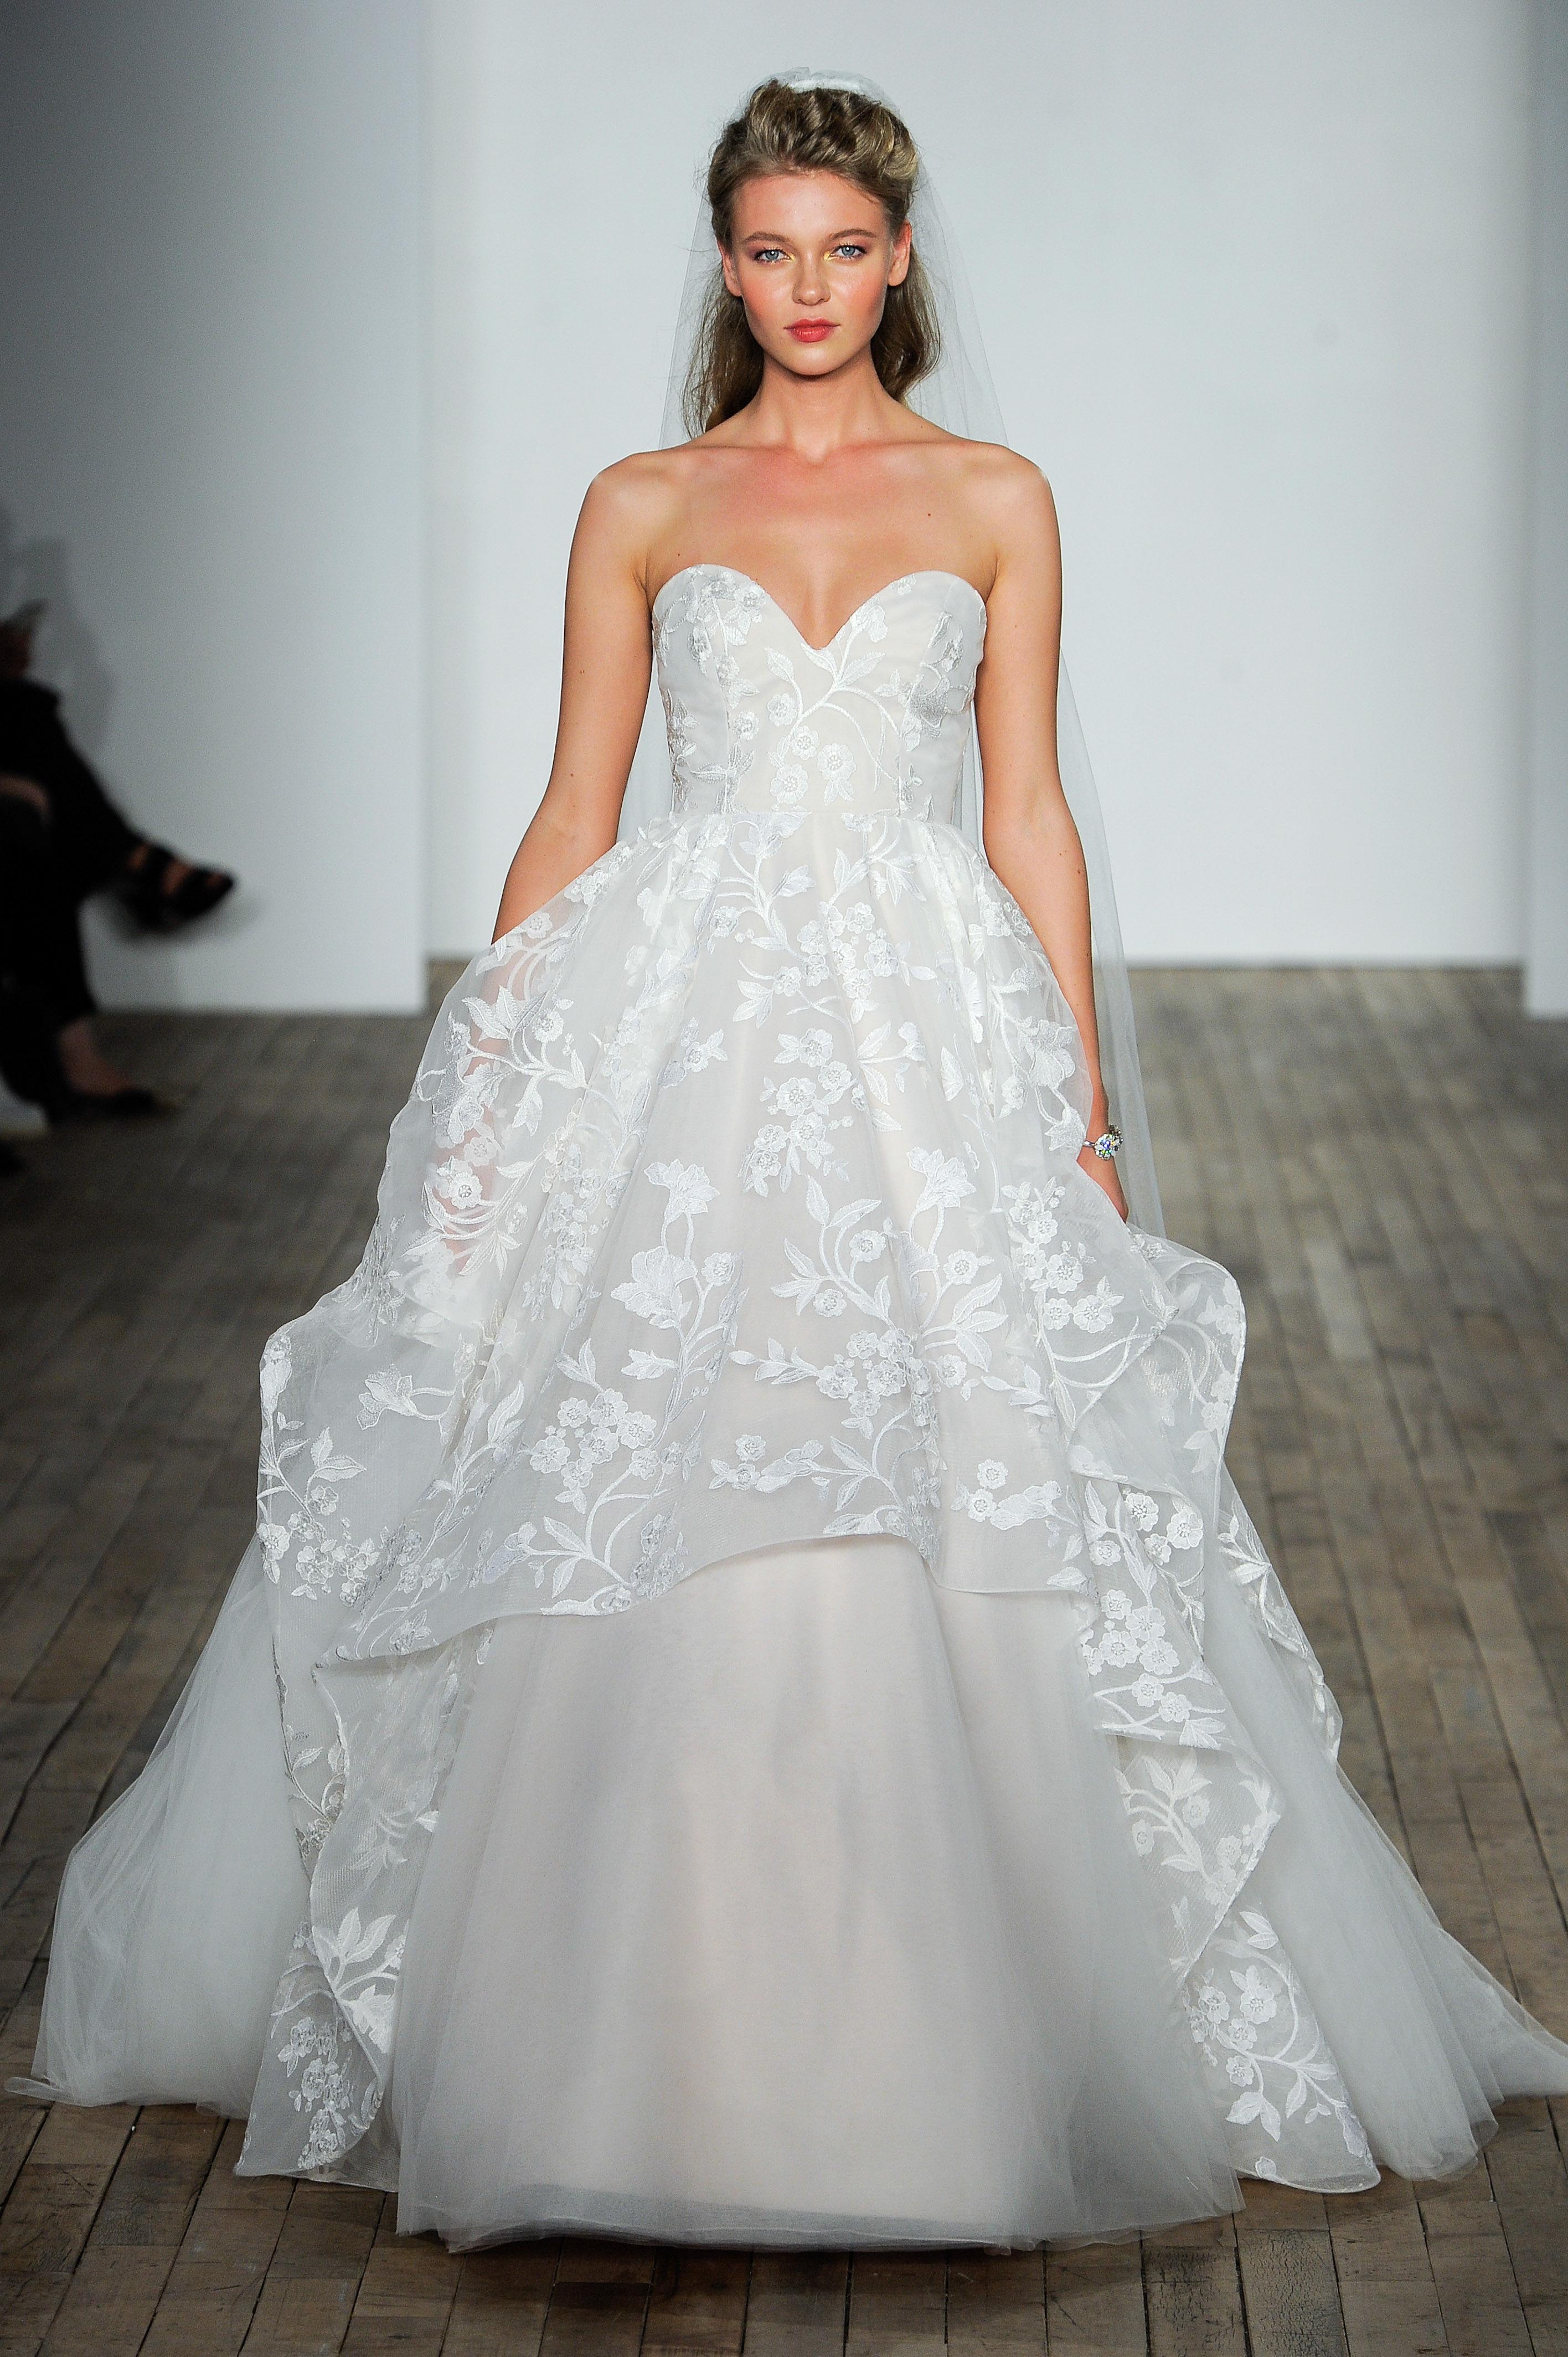 jlm blush by hayley paige wedding dress fall 2018 strapless sweetheart